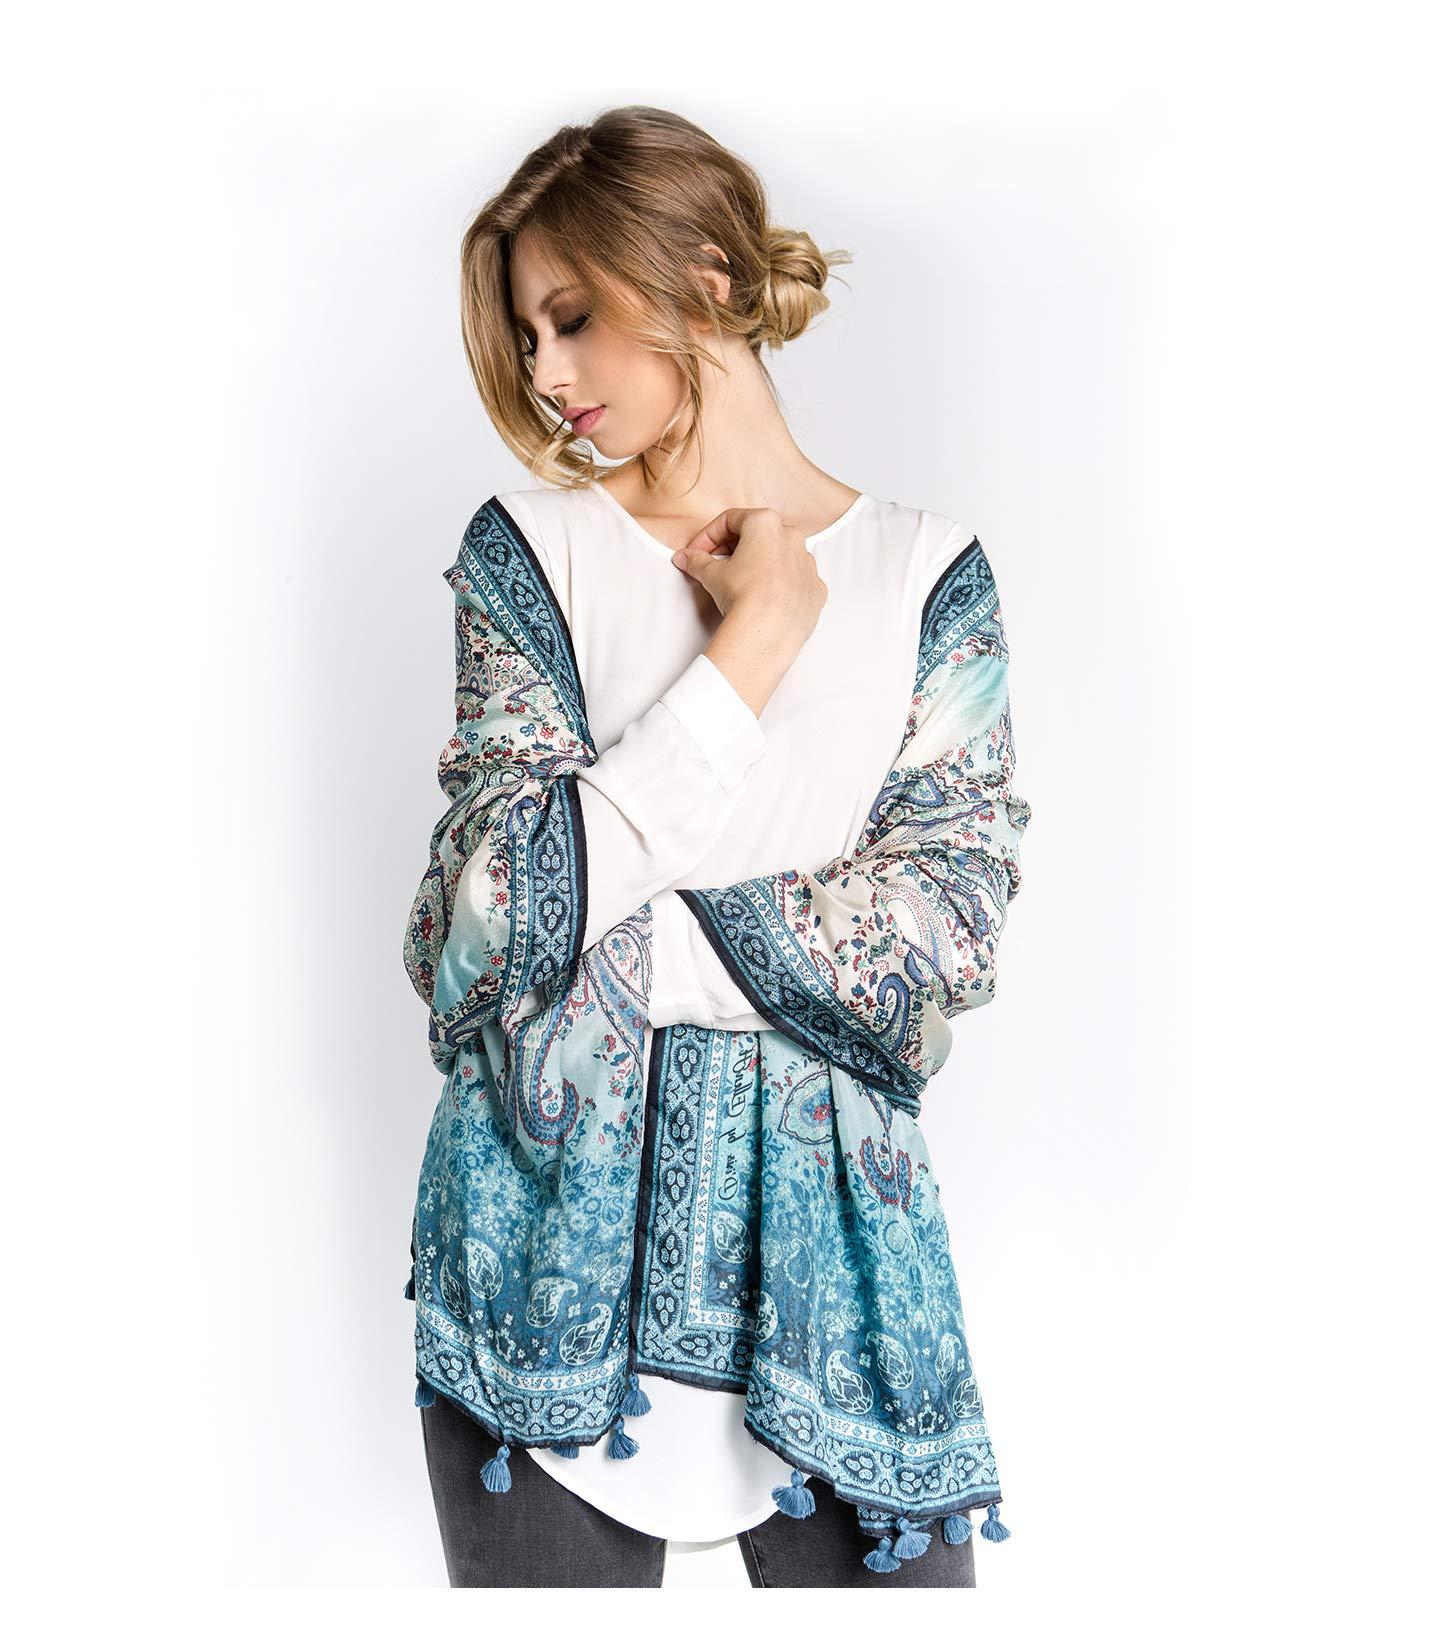 Fine Silk Scarf for Women-Luxury Fashion Print Extra Long Lightweight Wrap Shawl Headscarf by d'IRIS (Image #1)